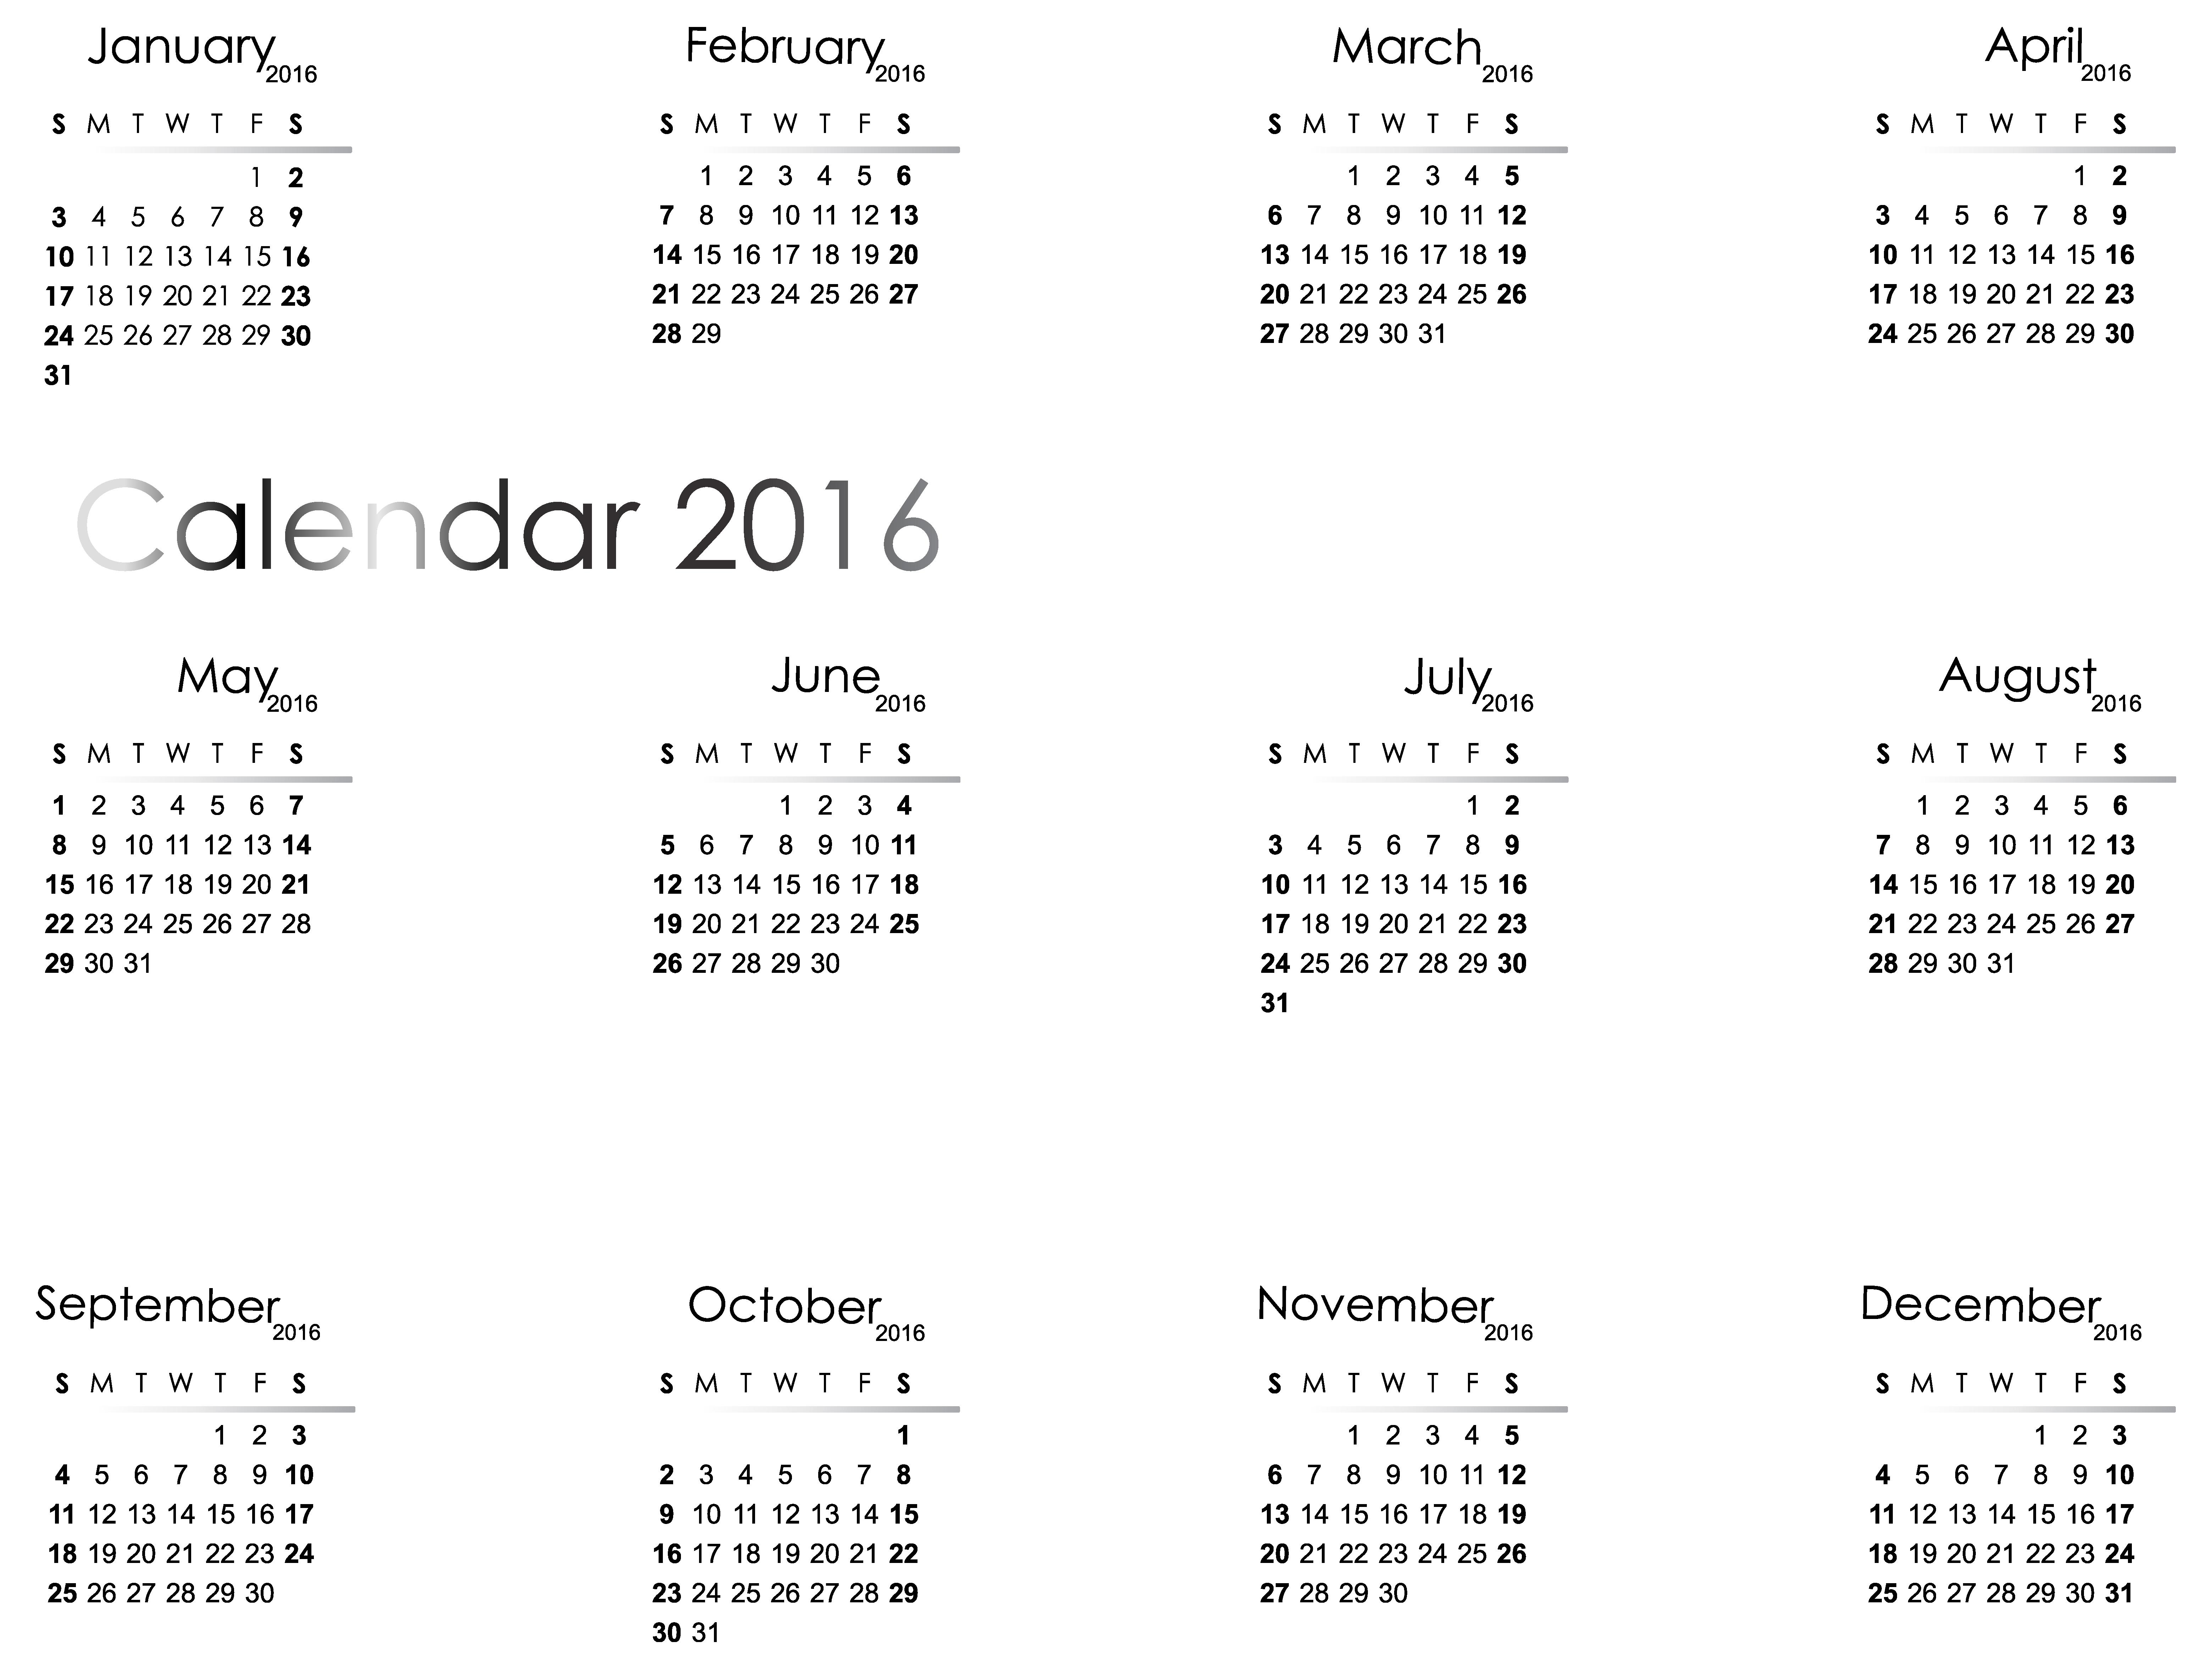 transparent calendar png. December clipart december 2016